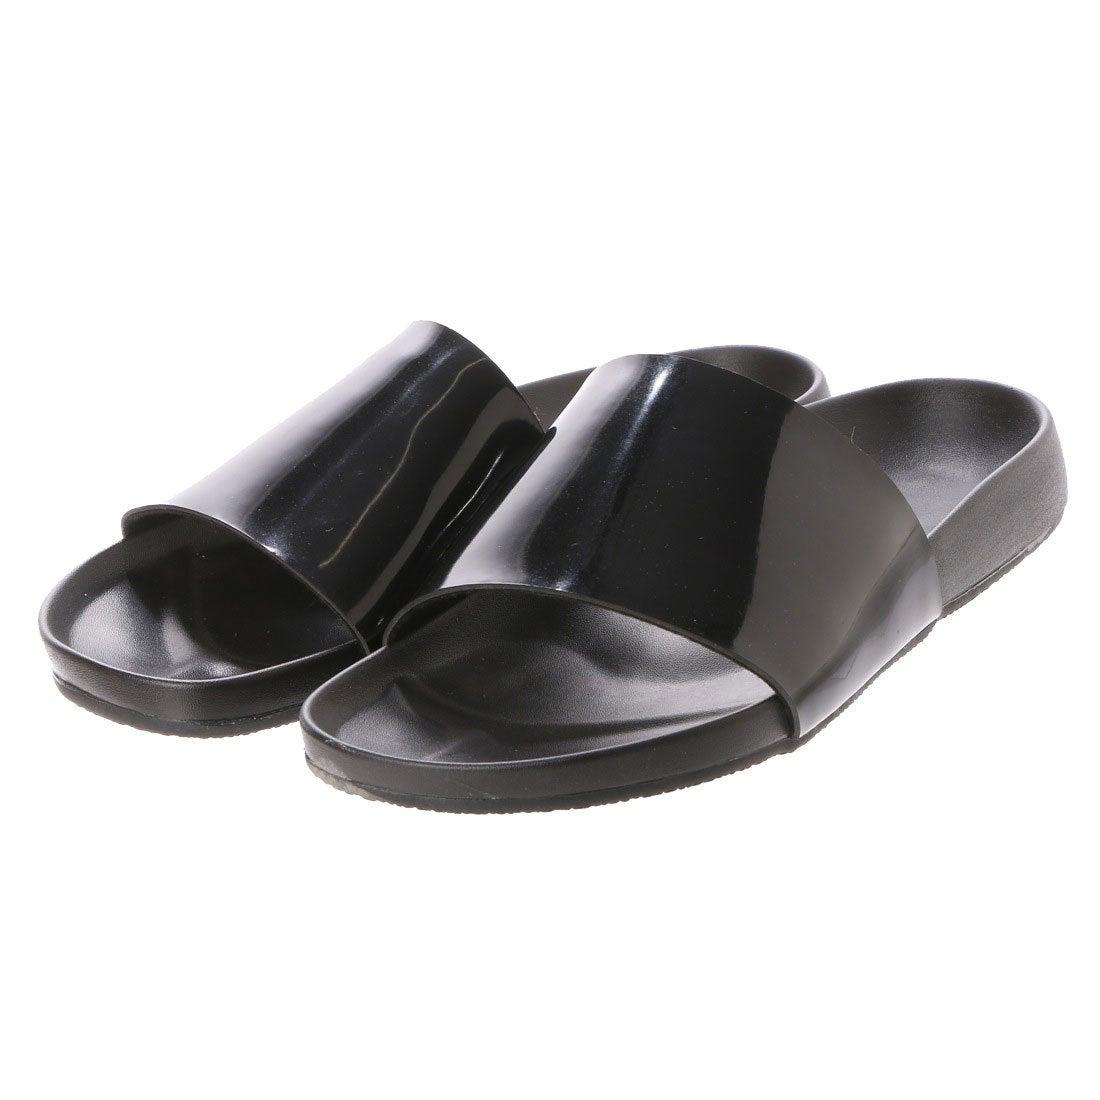 6f86f8138a8c24 AAA⁺ SFW サンエープラス AAA メンズシャワーサンダル (ブラックエナメル) -靴&ファッション通販 ロコンド〜自宅で試着、気軽に返品